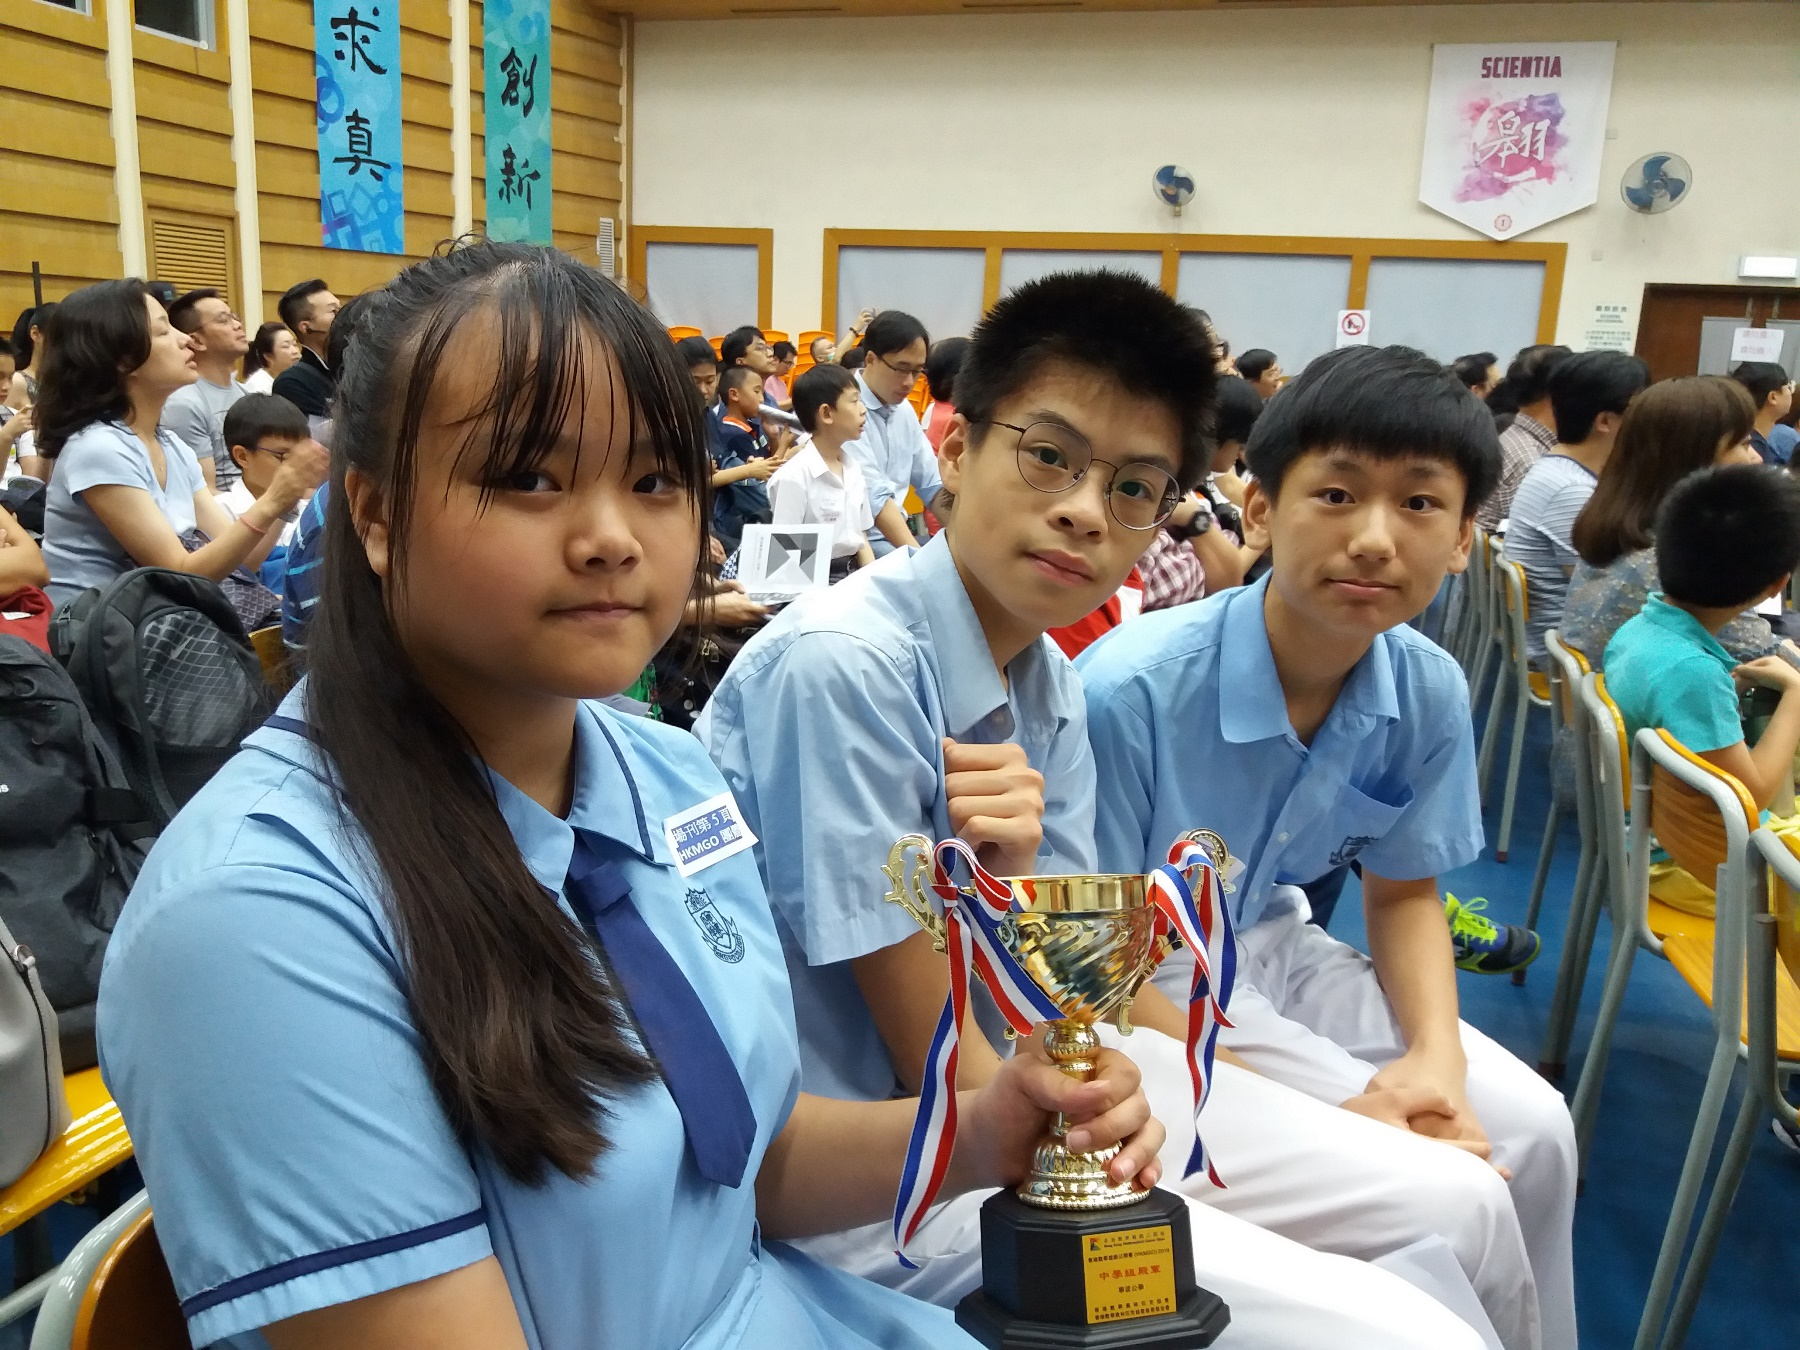 http://npc.edu.hk/sites/default/files/20190607_145556.jpg